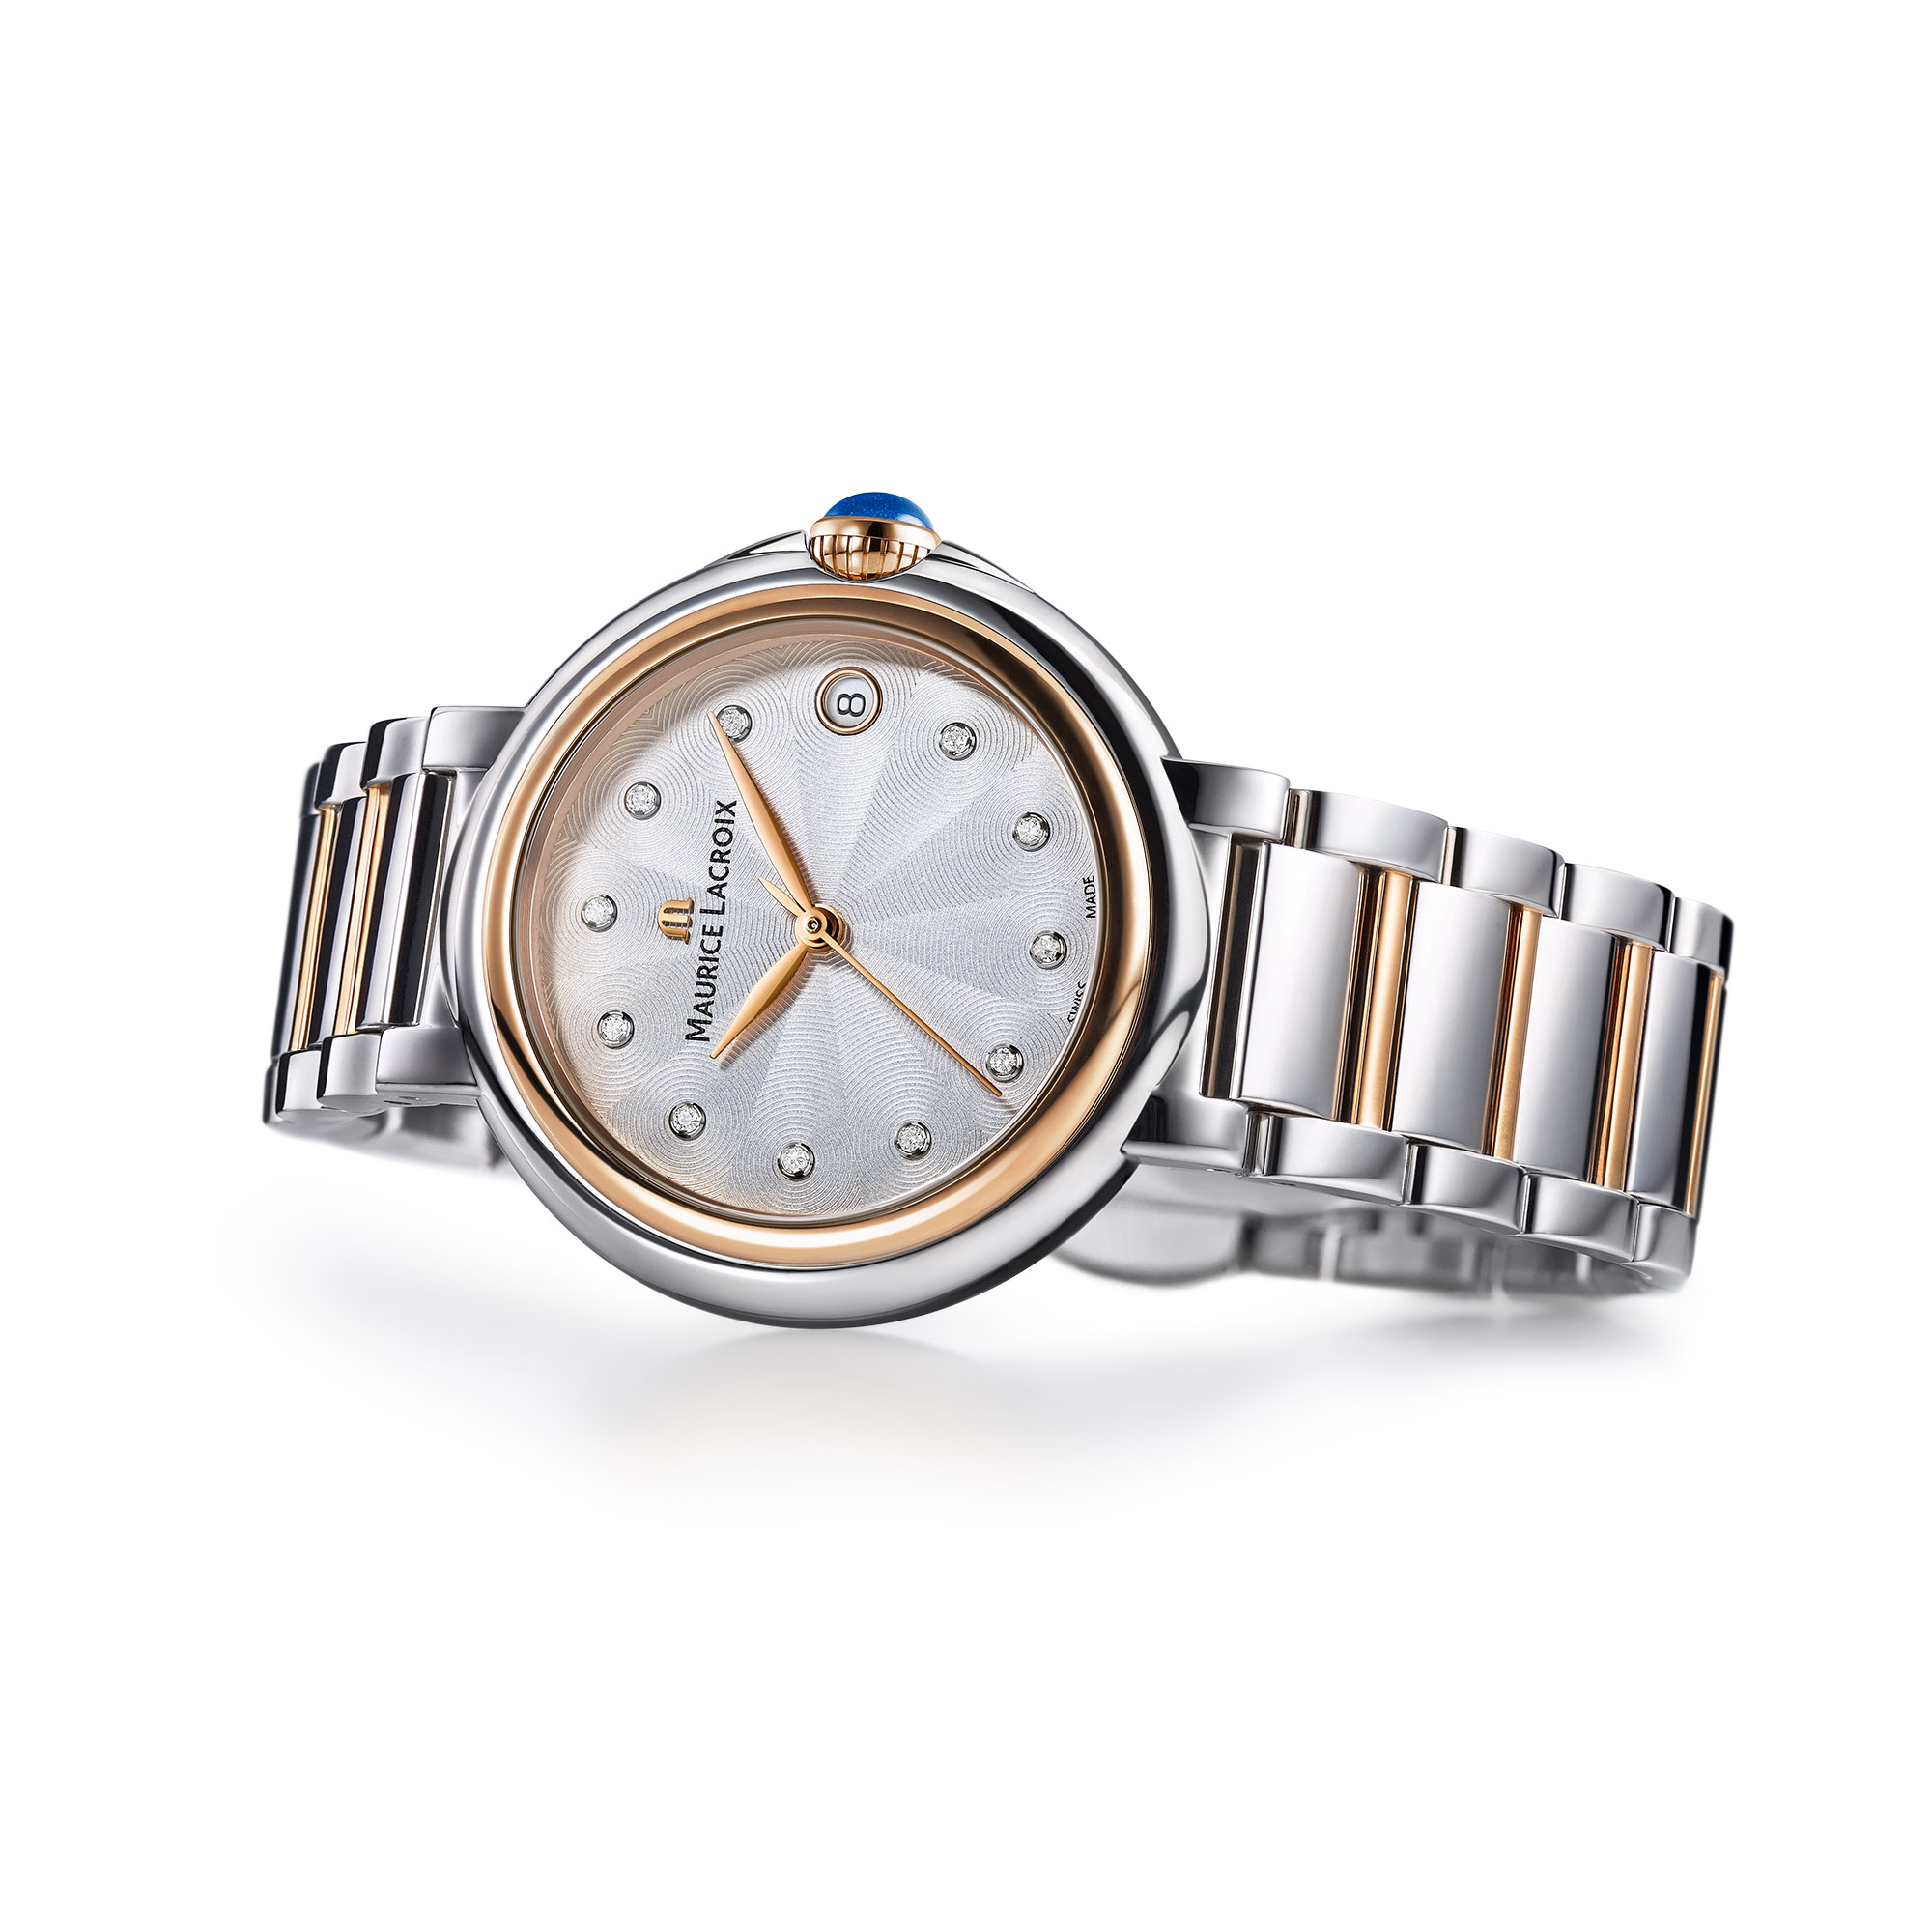 Maurice Lacroix Uhr Diamant Fiaba Date Fa1004 Pvp13 150 1